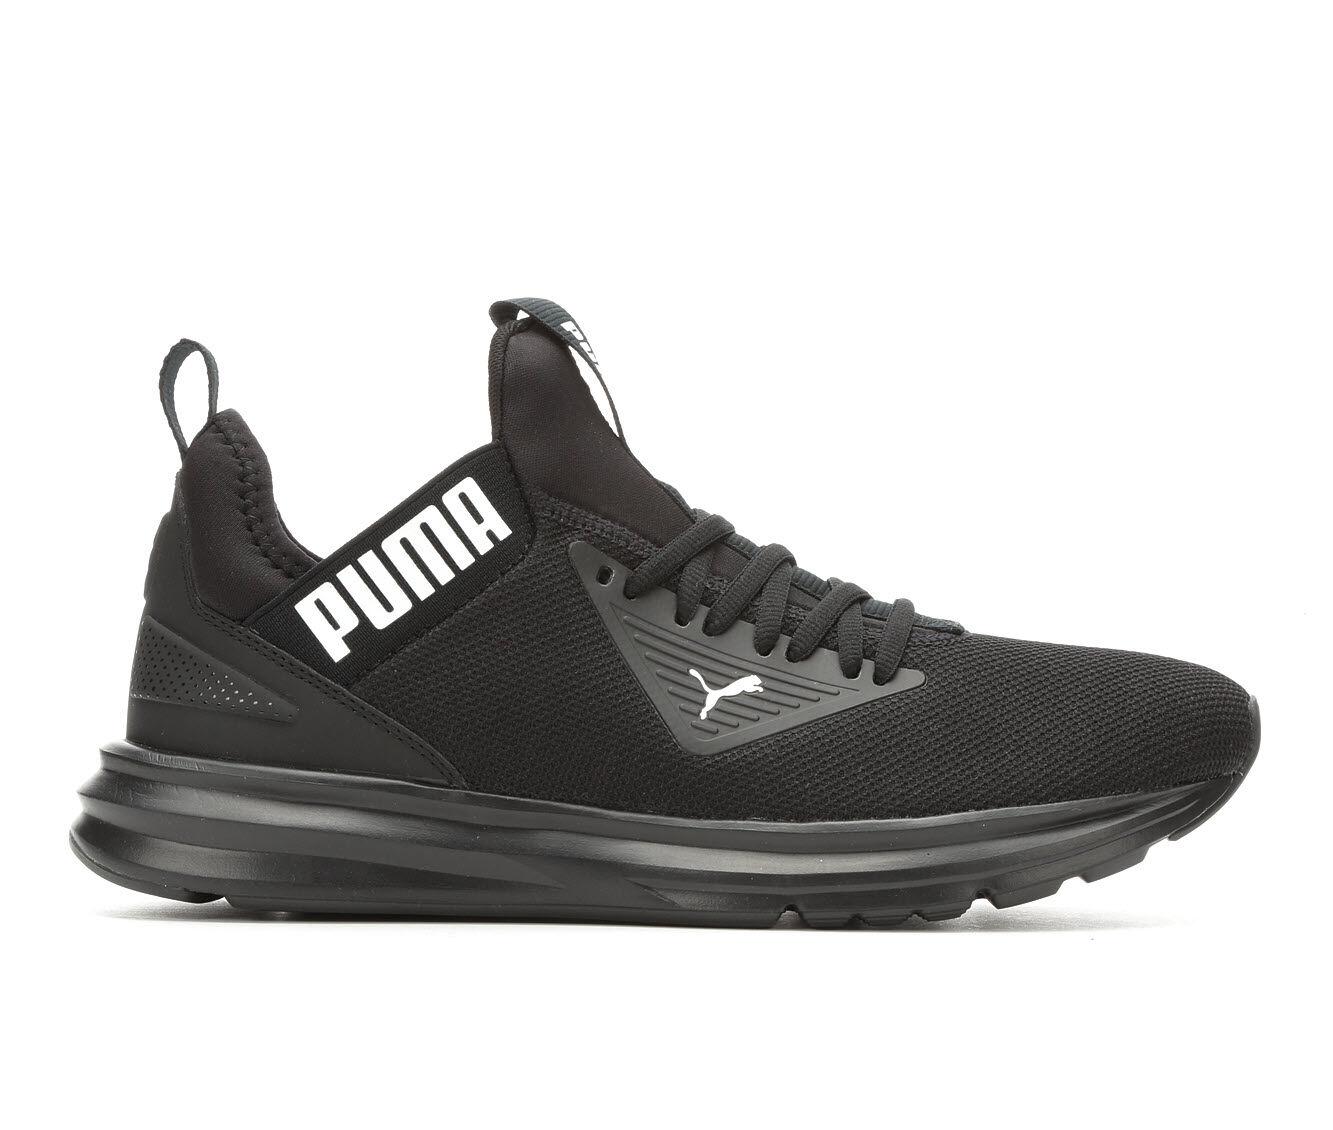 Men's Puma Enzo Beta Sneakers Blk/Wht